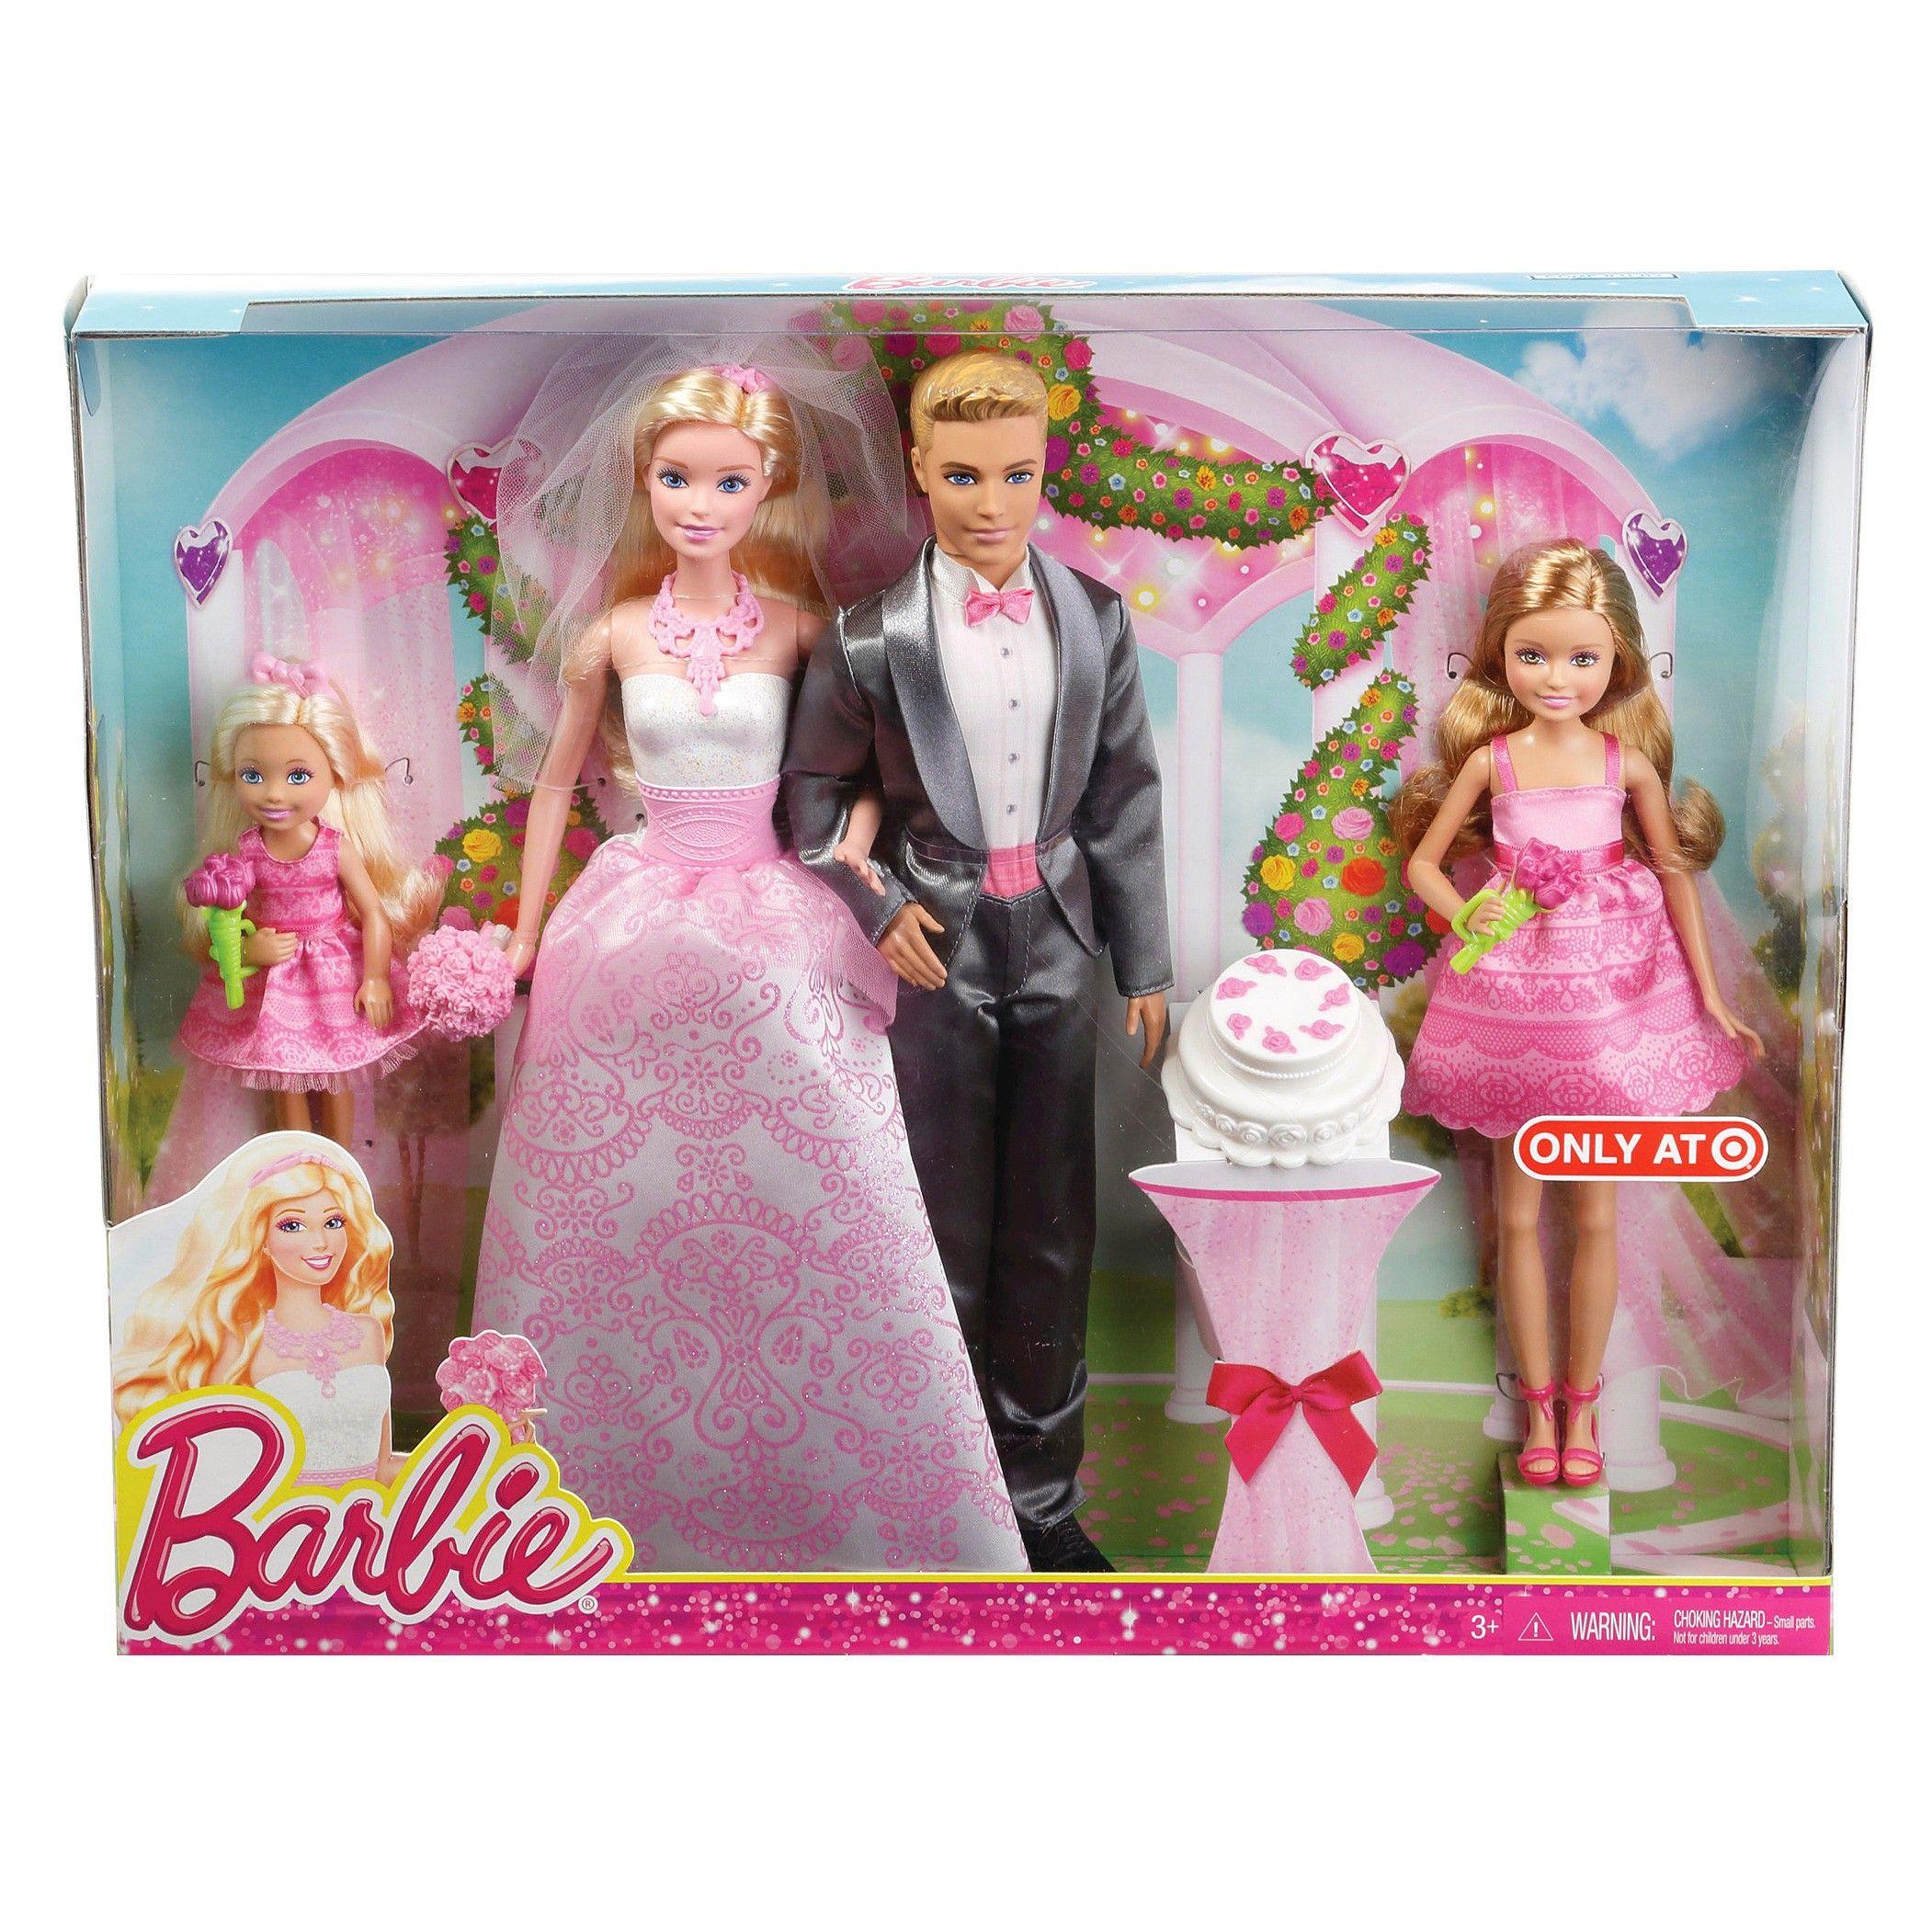 Barbie Wedding Giftset 2015 Wedding gift set, Barbie bride